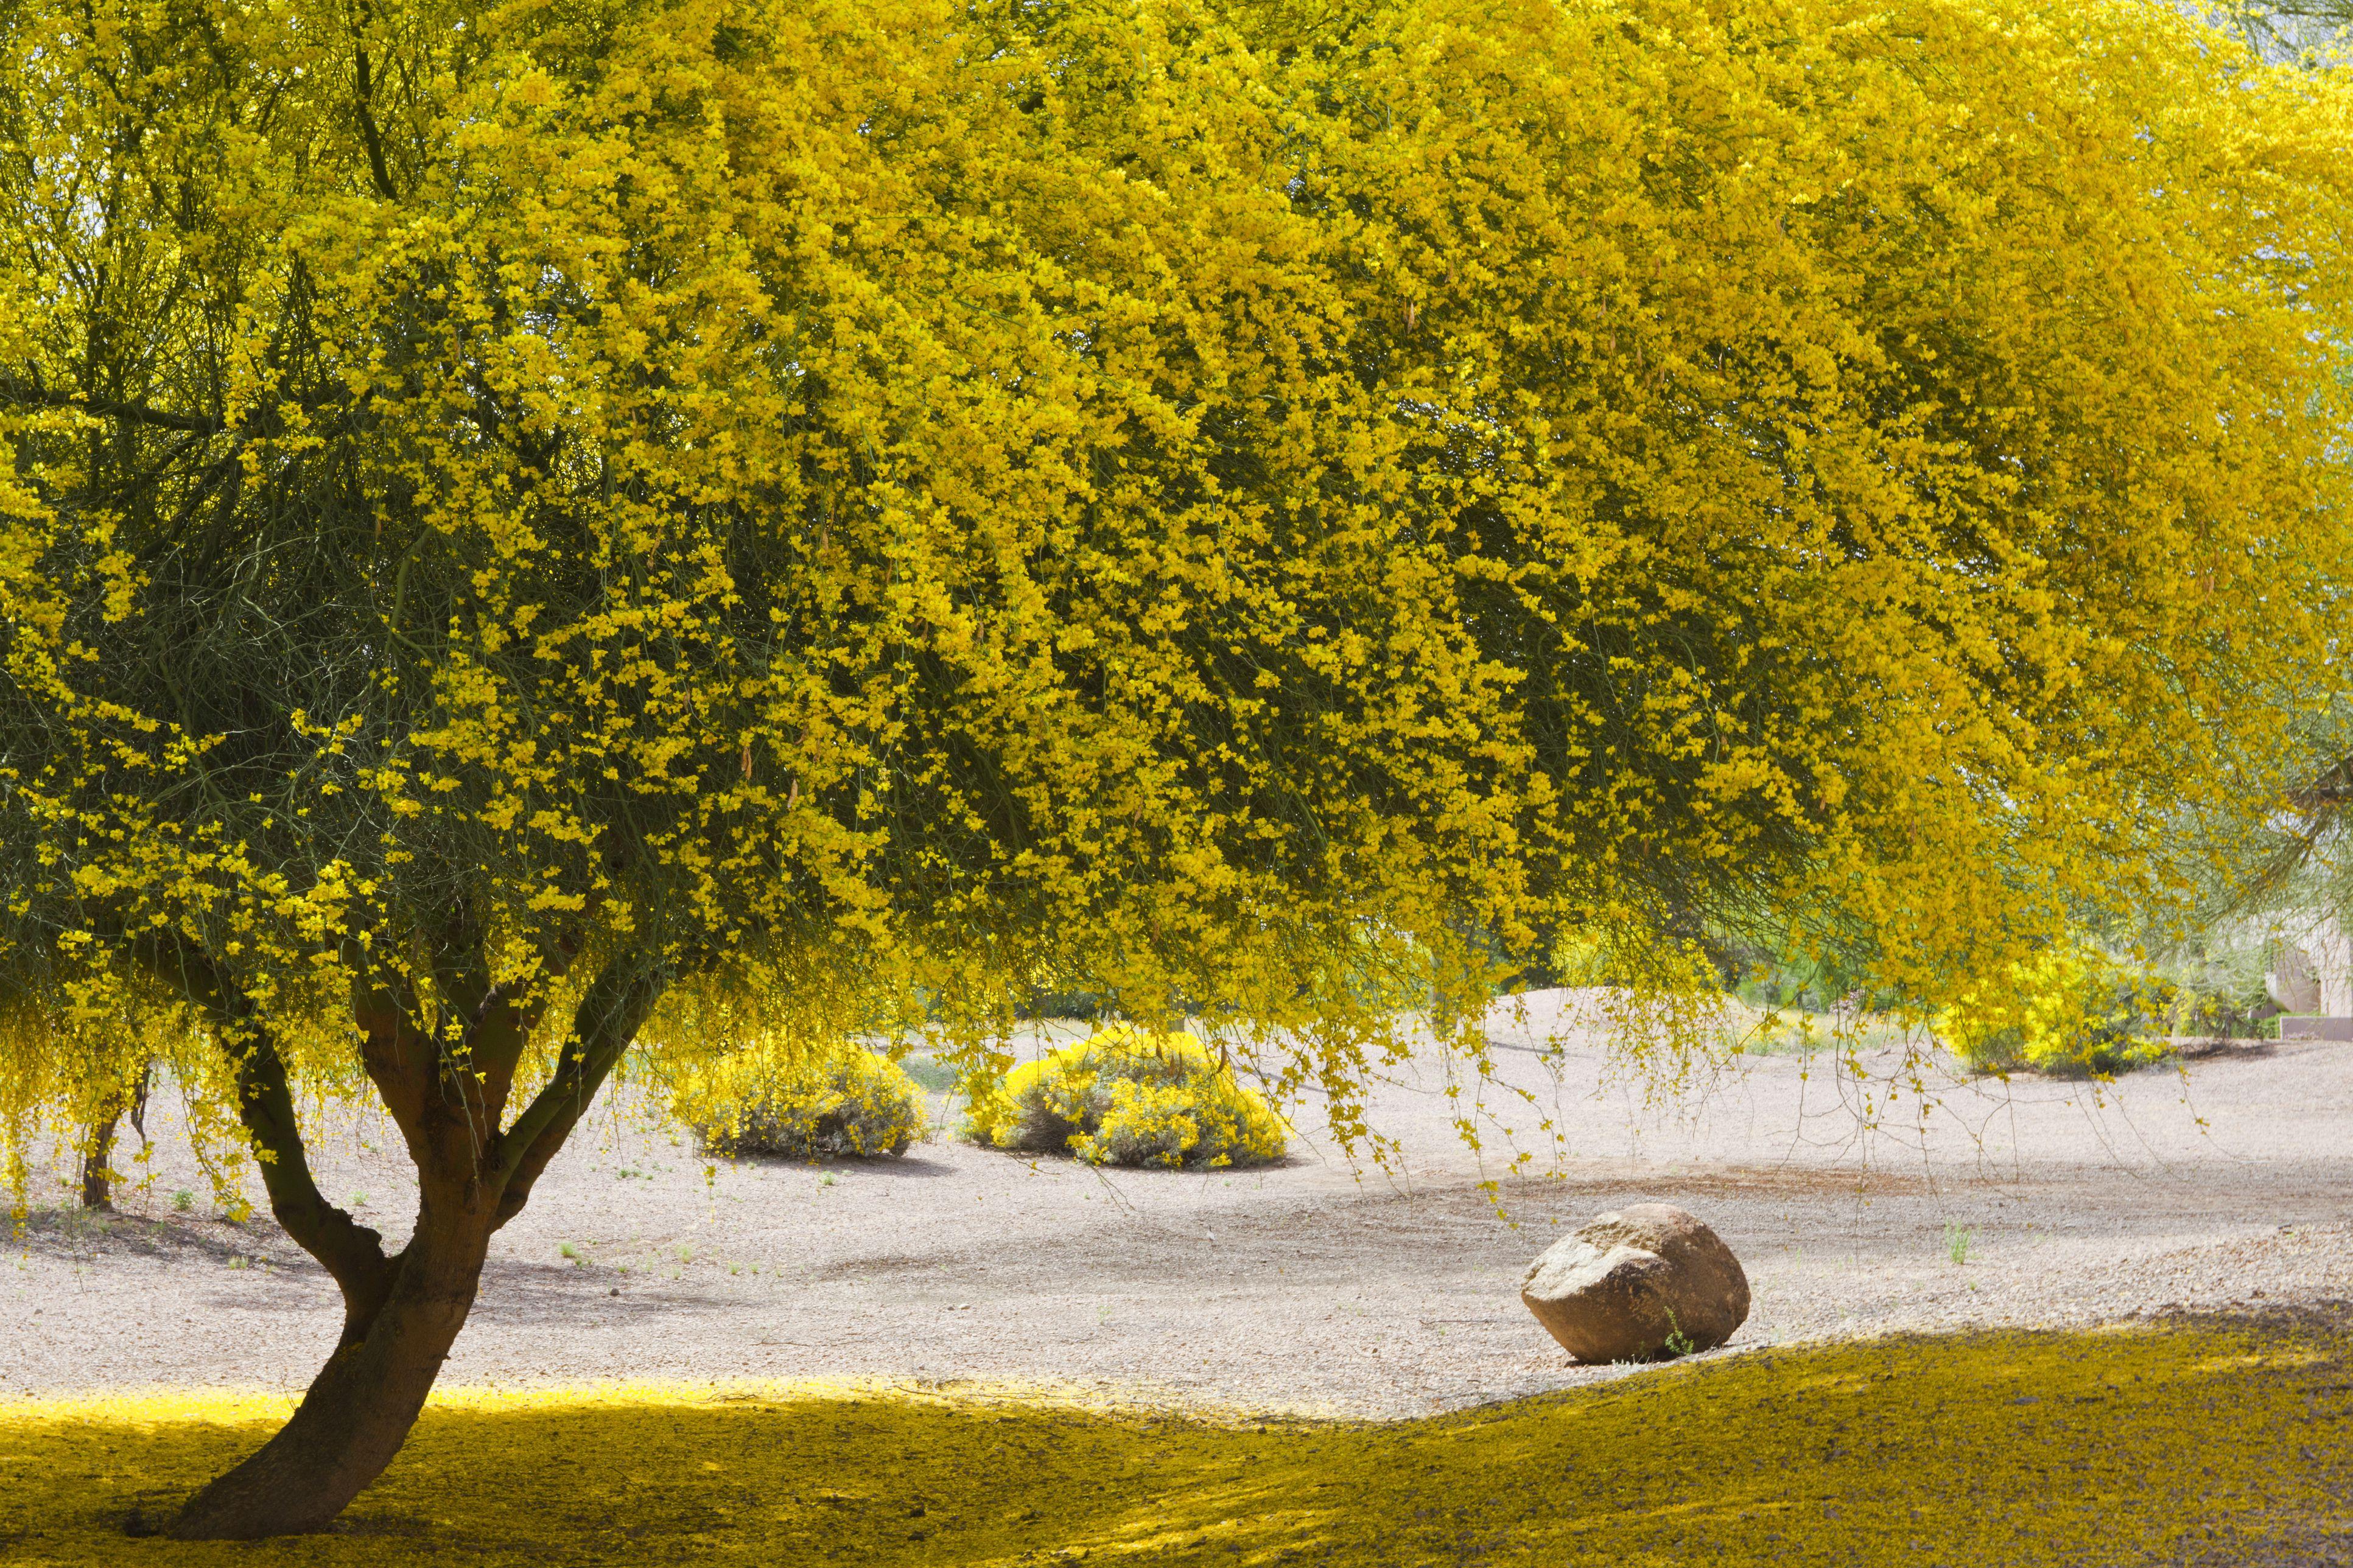 Paloverde tree in full bloom